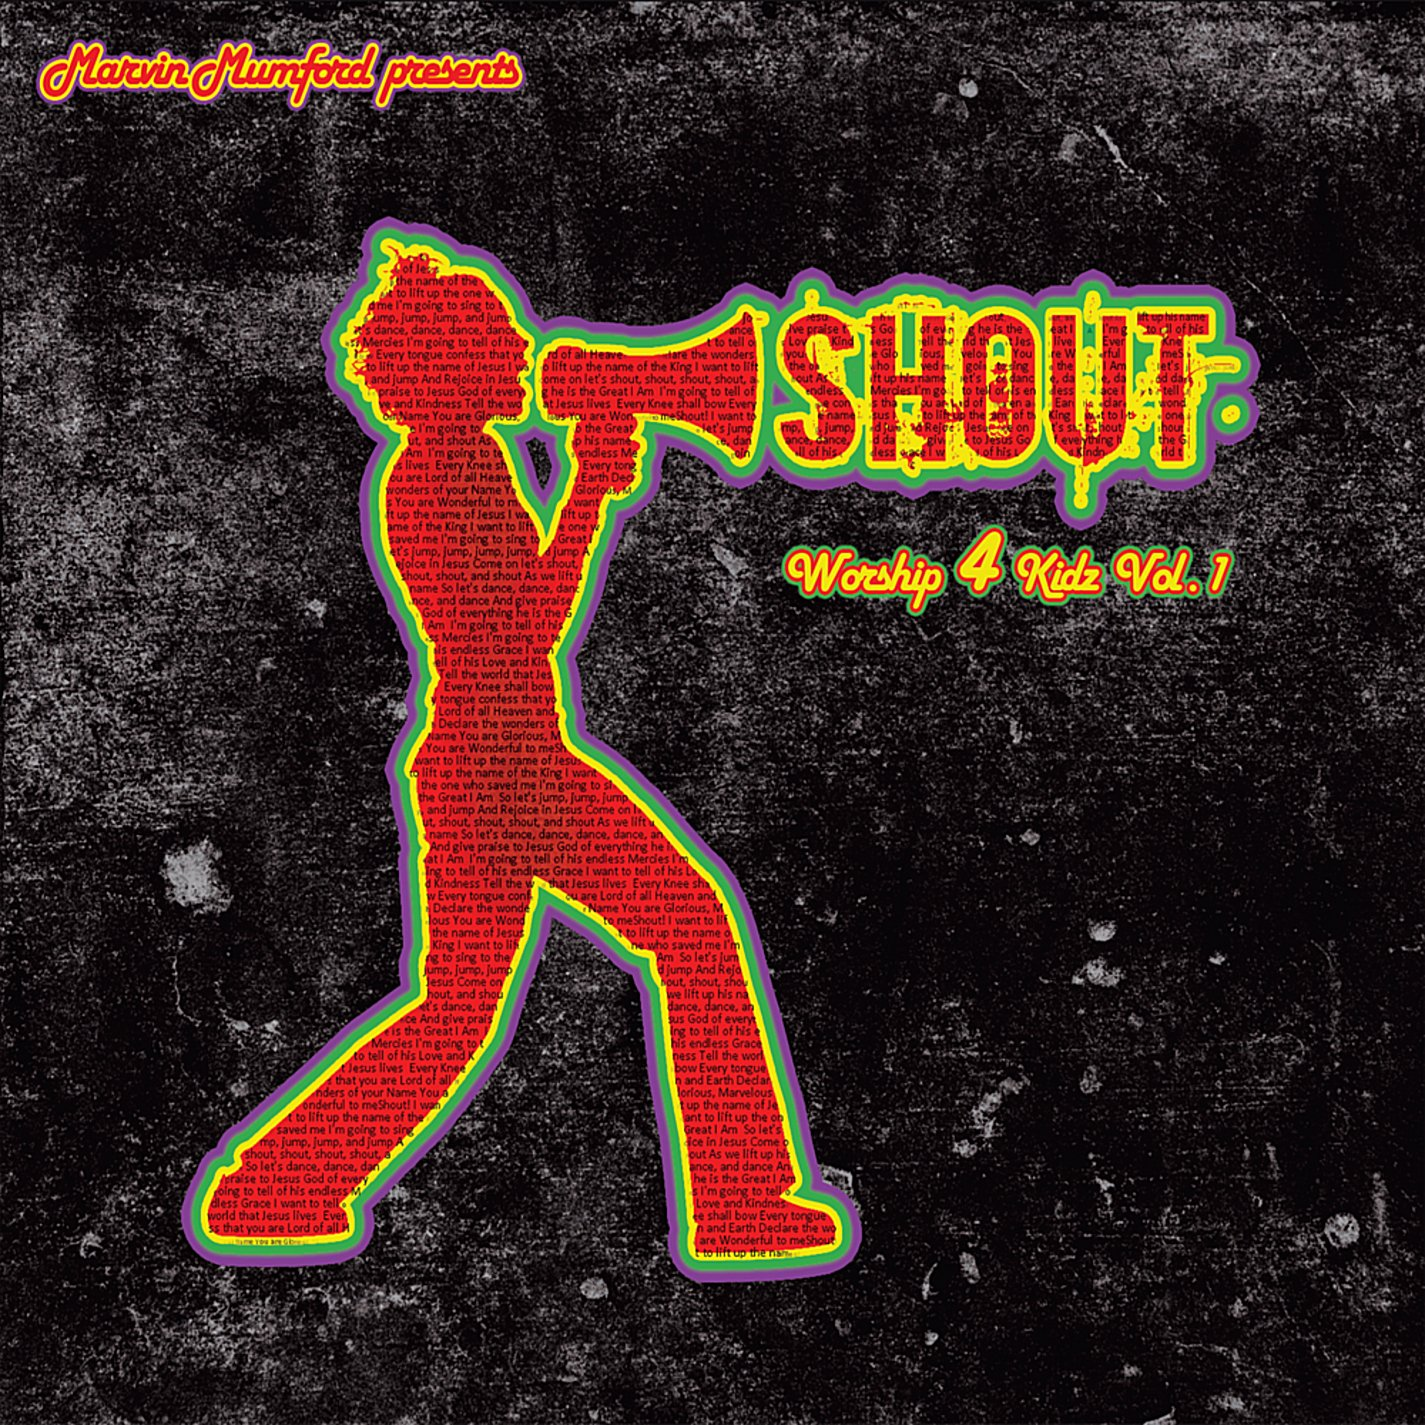 Vol.1-Shout Worship 4 Kidz